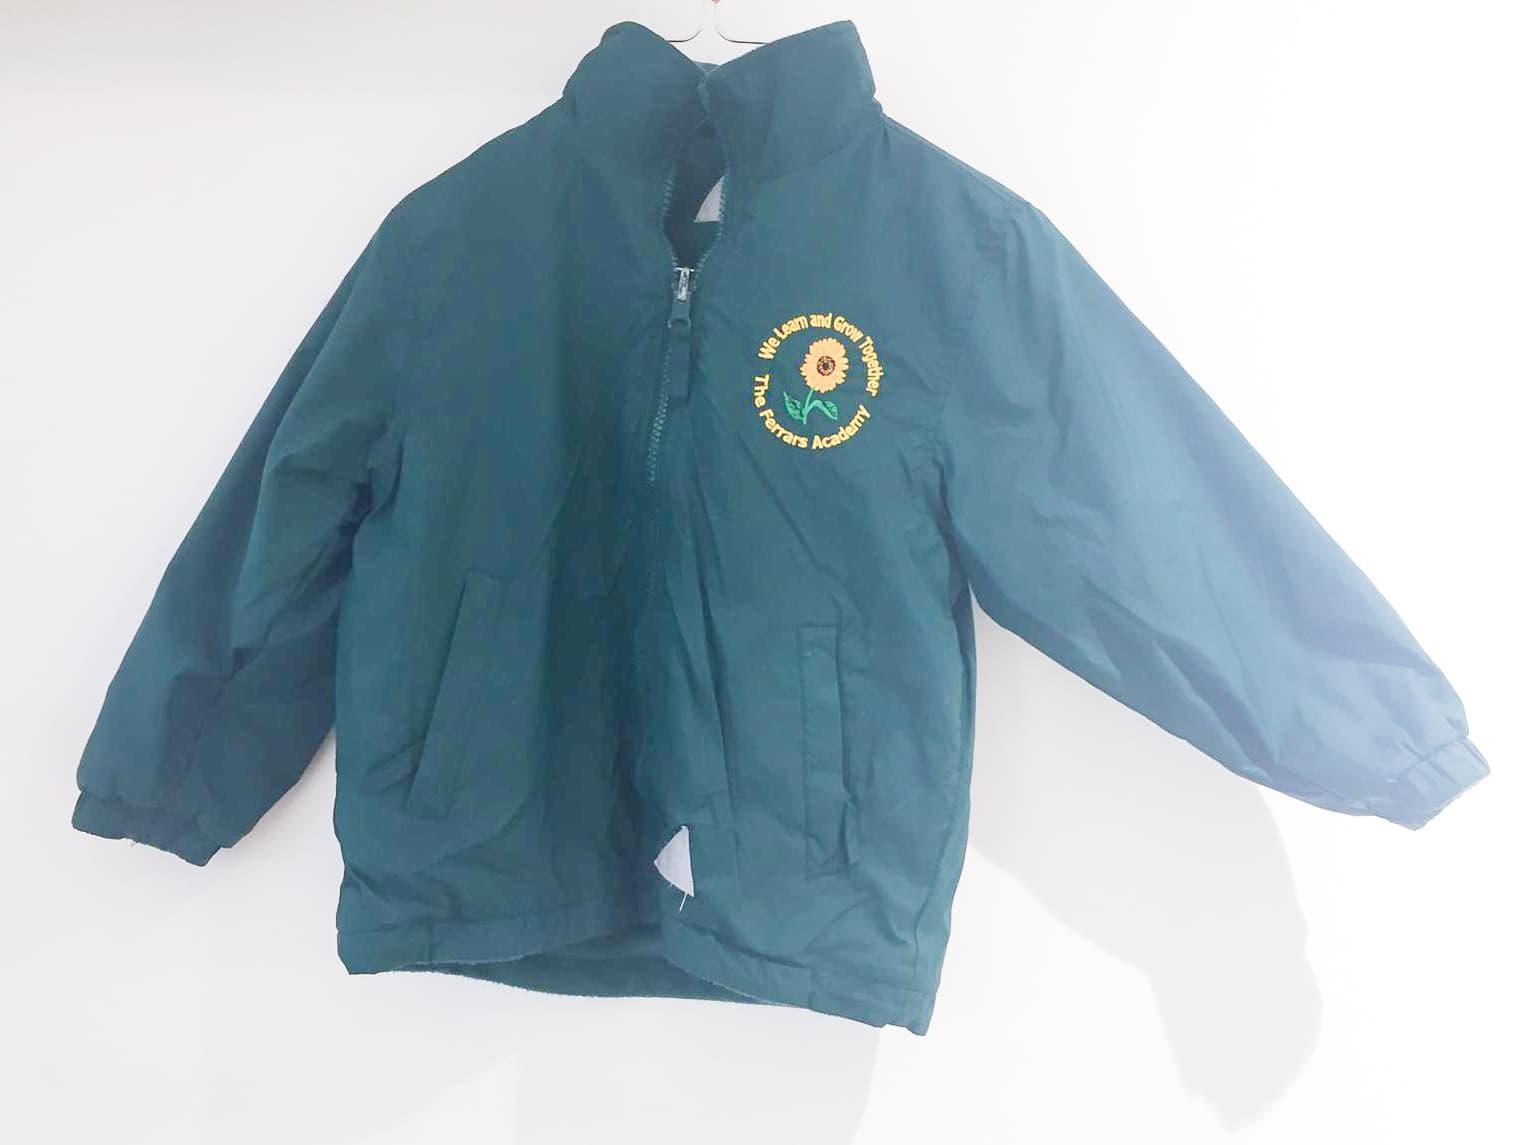 Green reversible coat